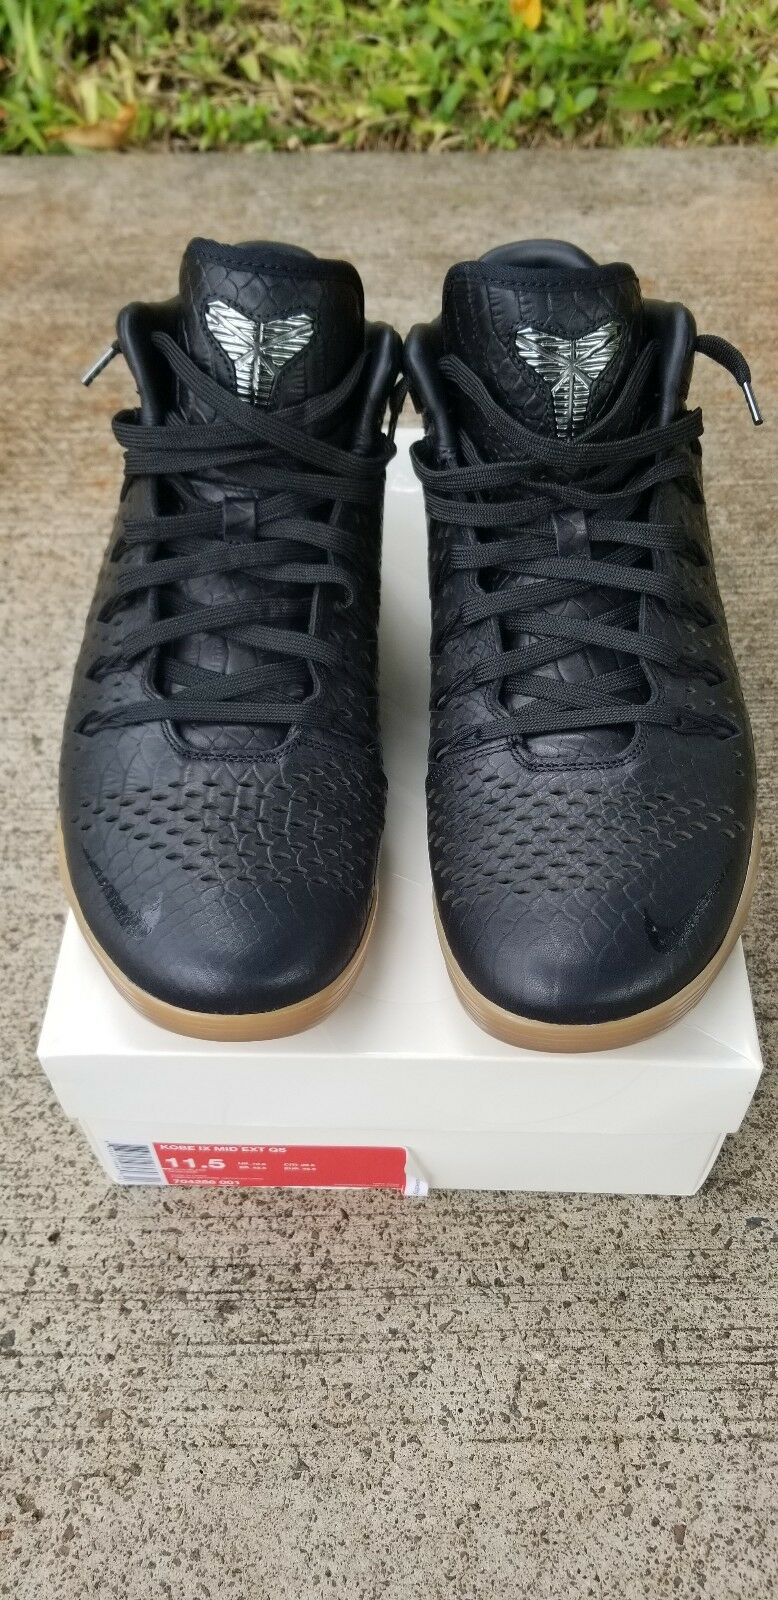 Nike Kobe IX 9 Mid EXT Black Gum Snakeskin Men's Size 11.5